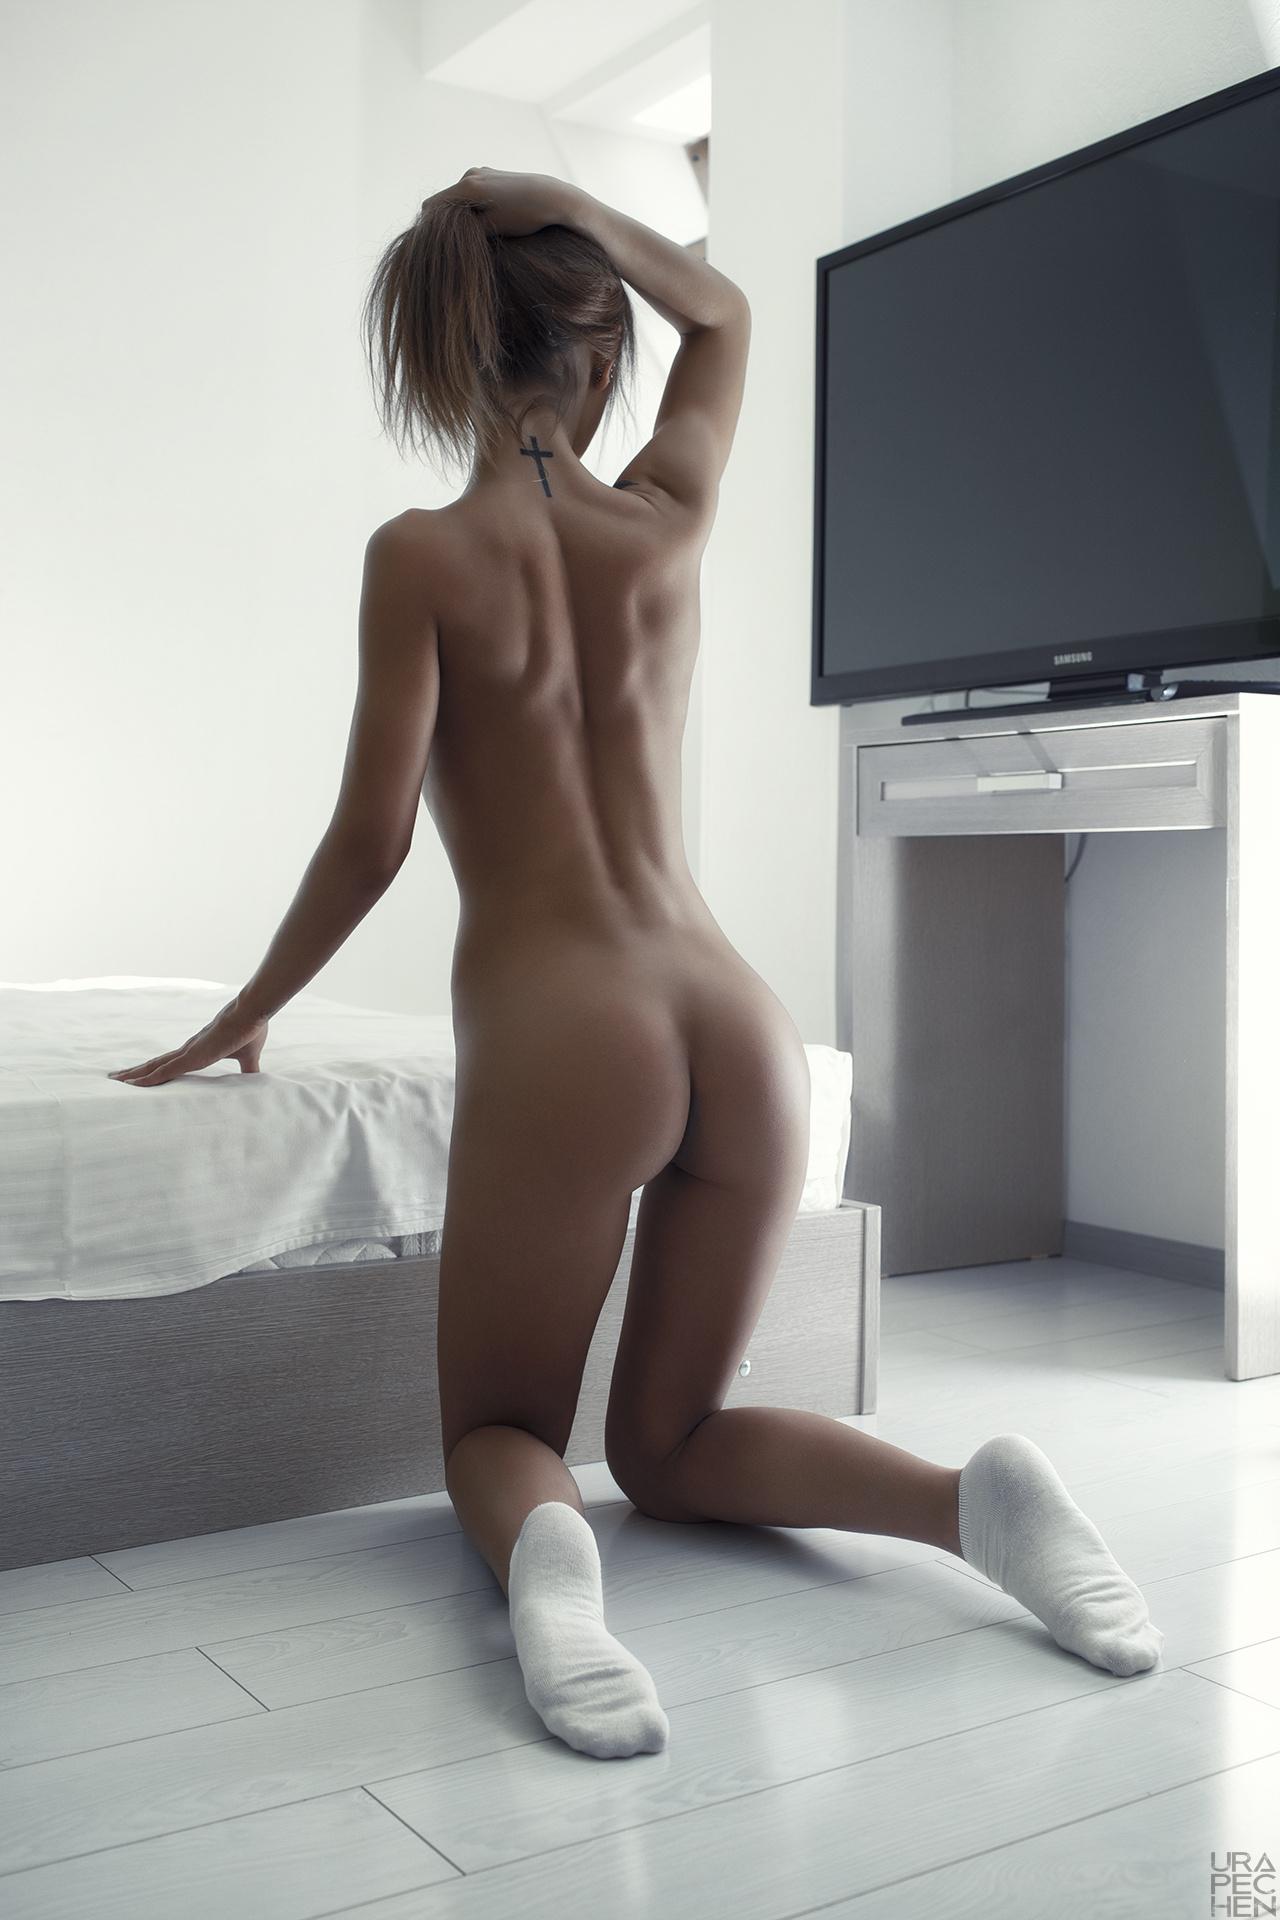 Sexy Nude Cross X Ura Pechen Boobs | Hello Kisses